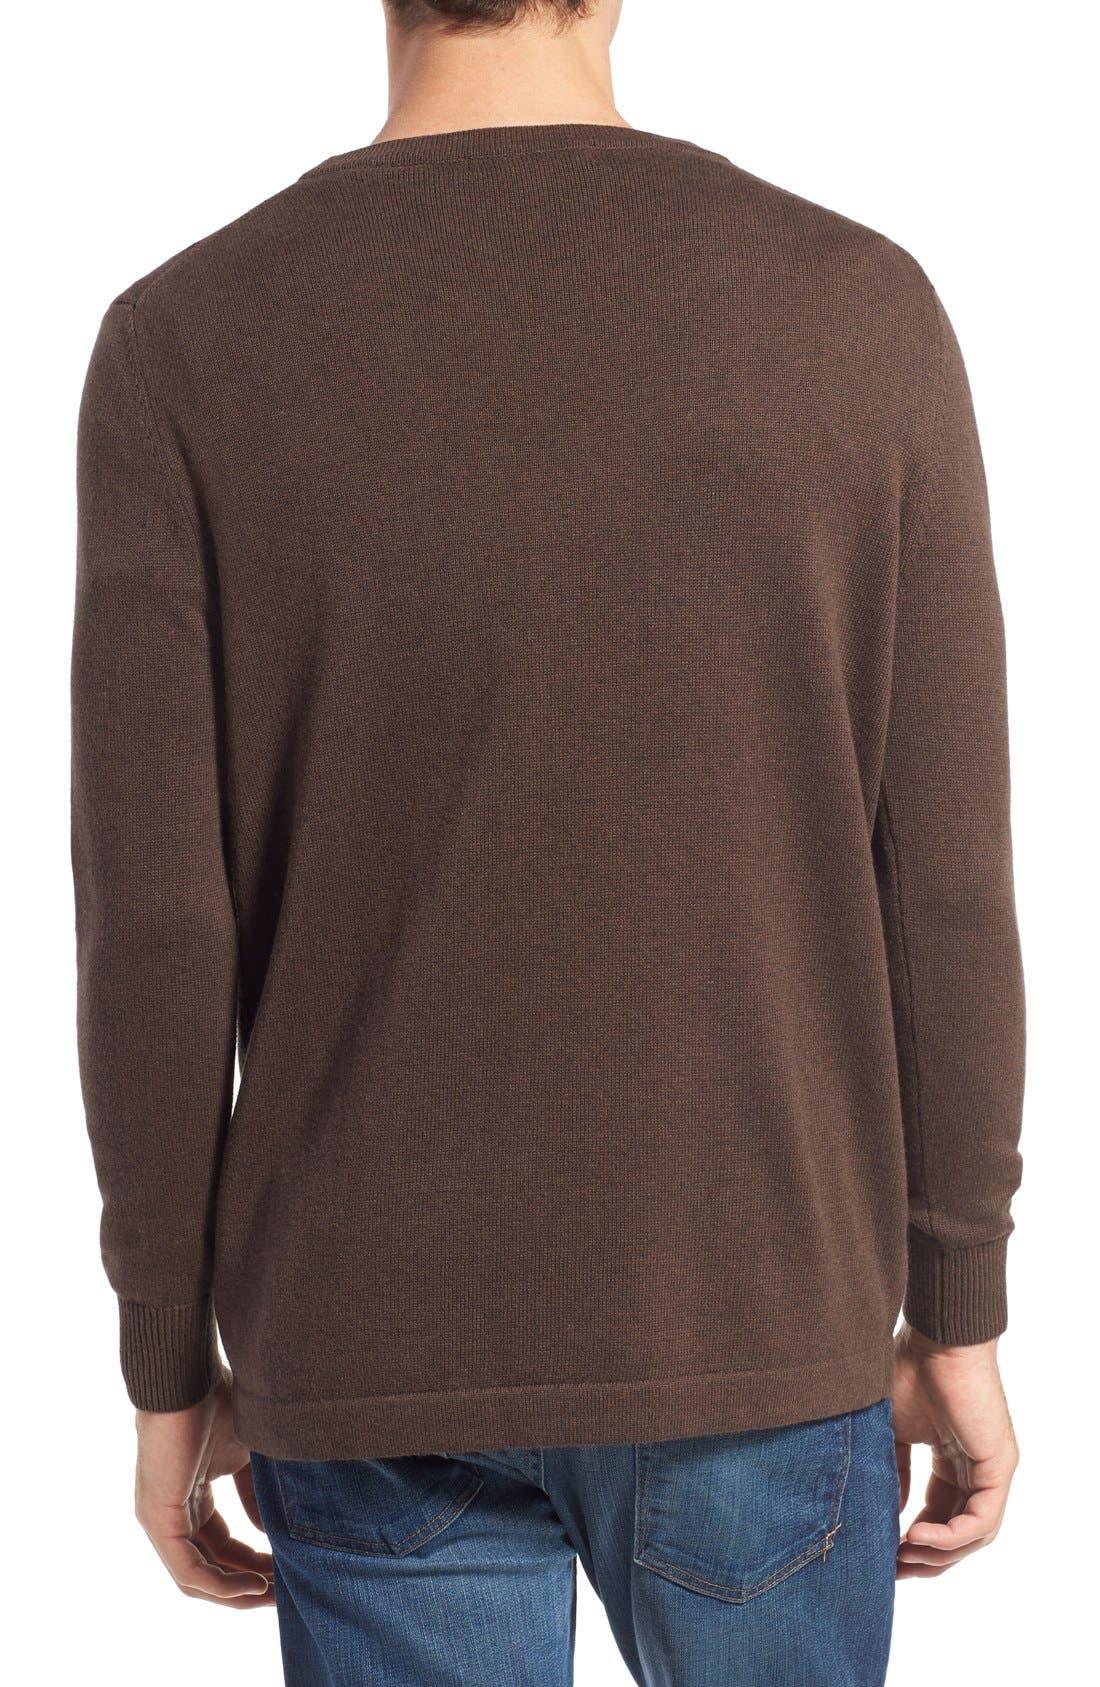 'San Francisco' Crewneck Sweater,                             Alternate thumbnail 2, color,                             245